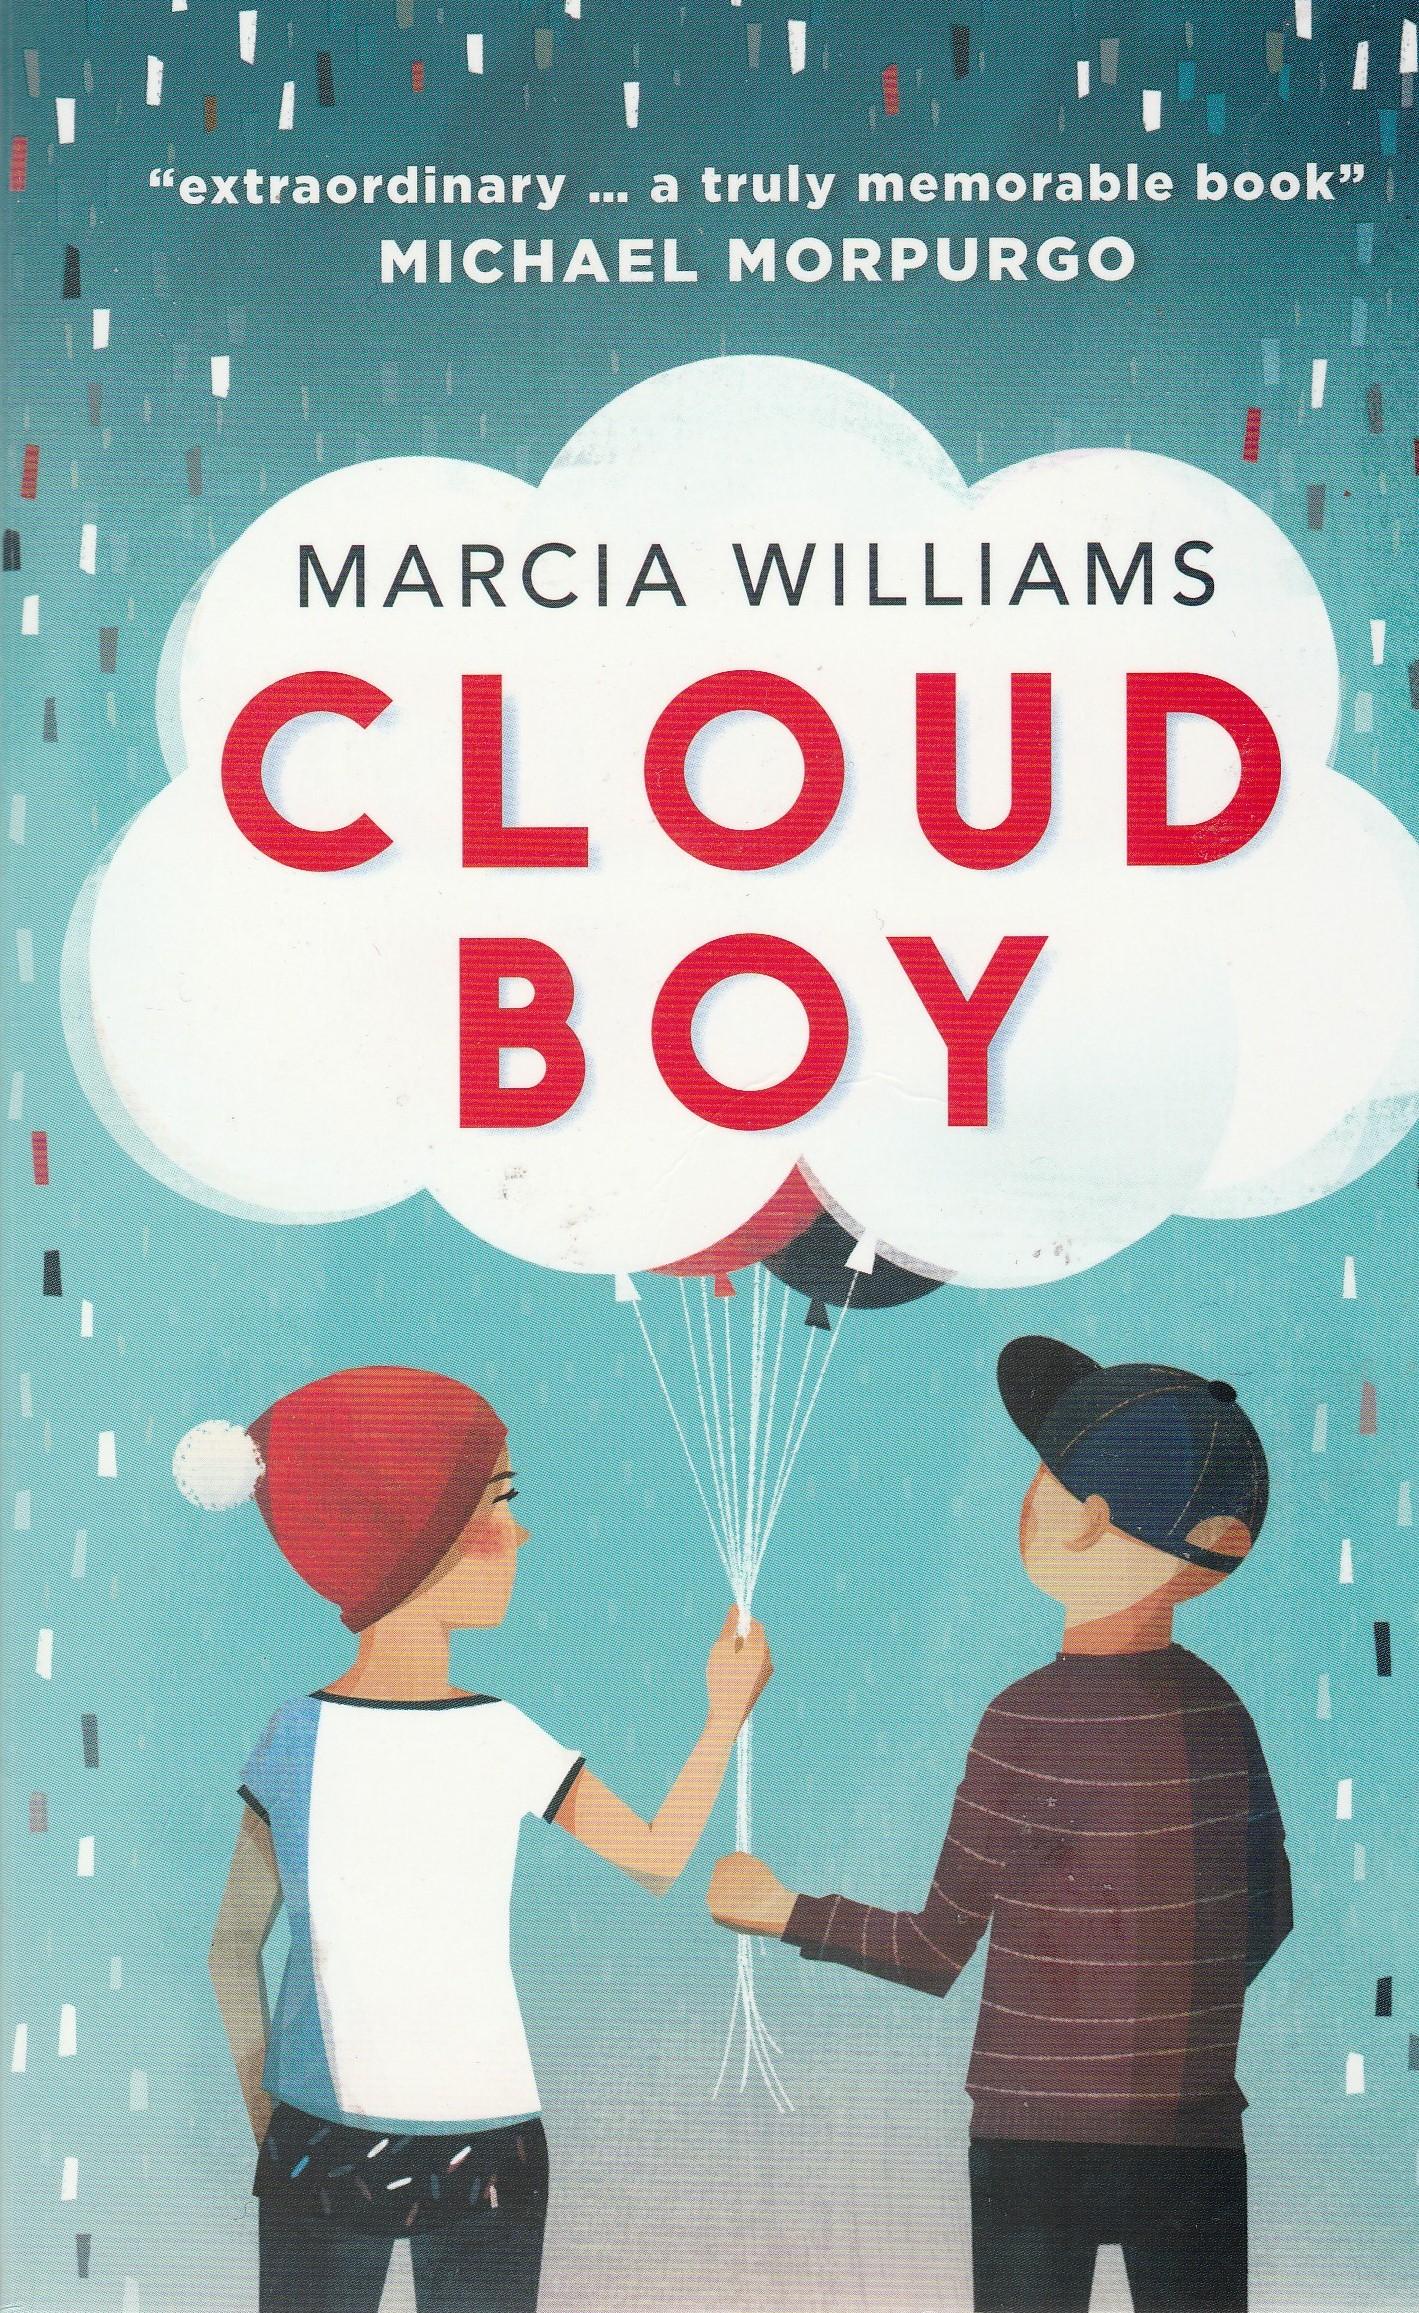 cloud boy